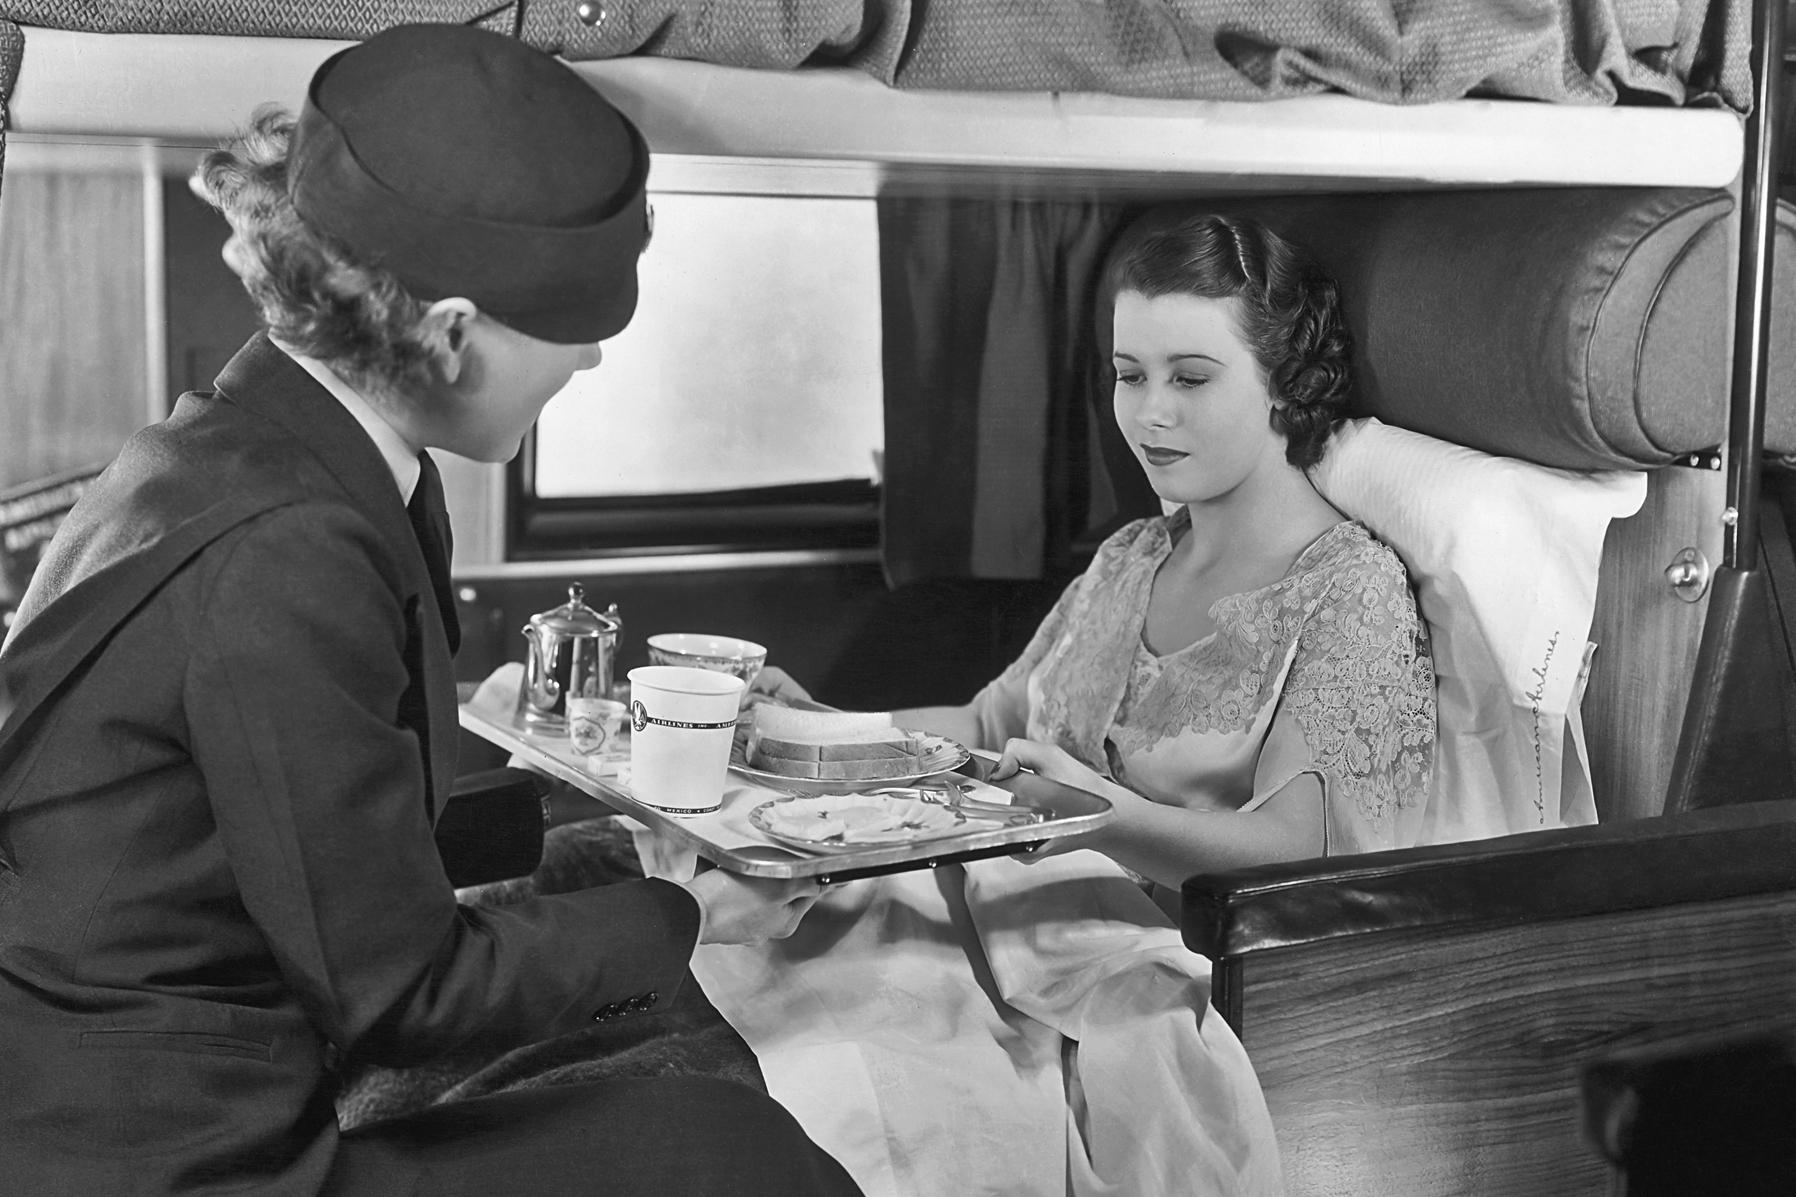 A Bumpy Ride: Airplane Food Through The Decades | NCPR News